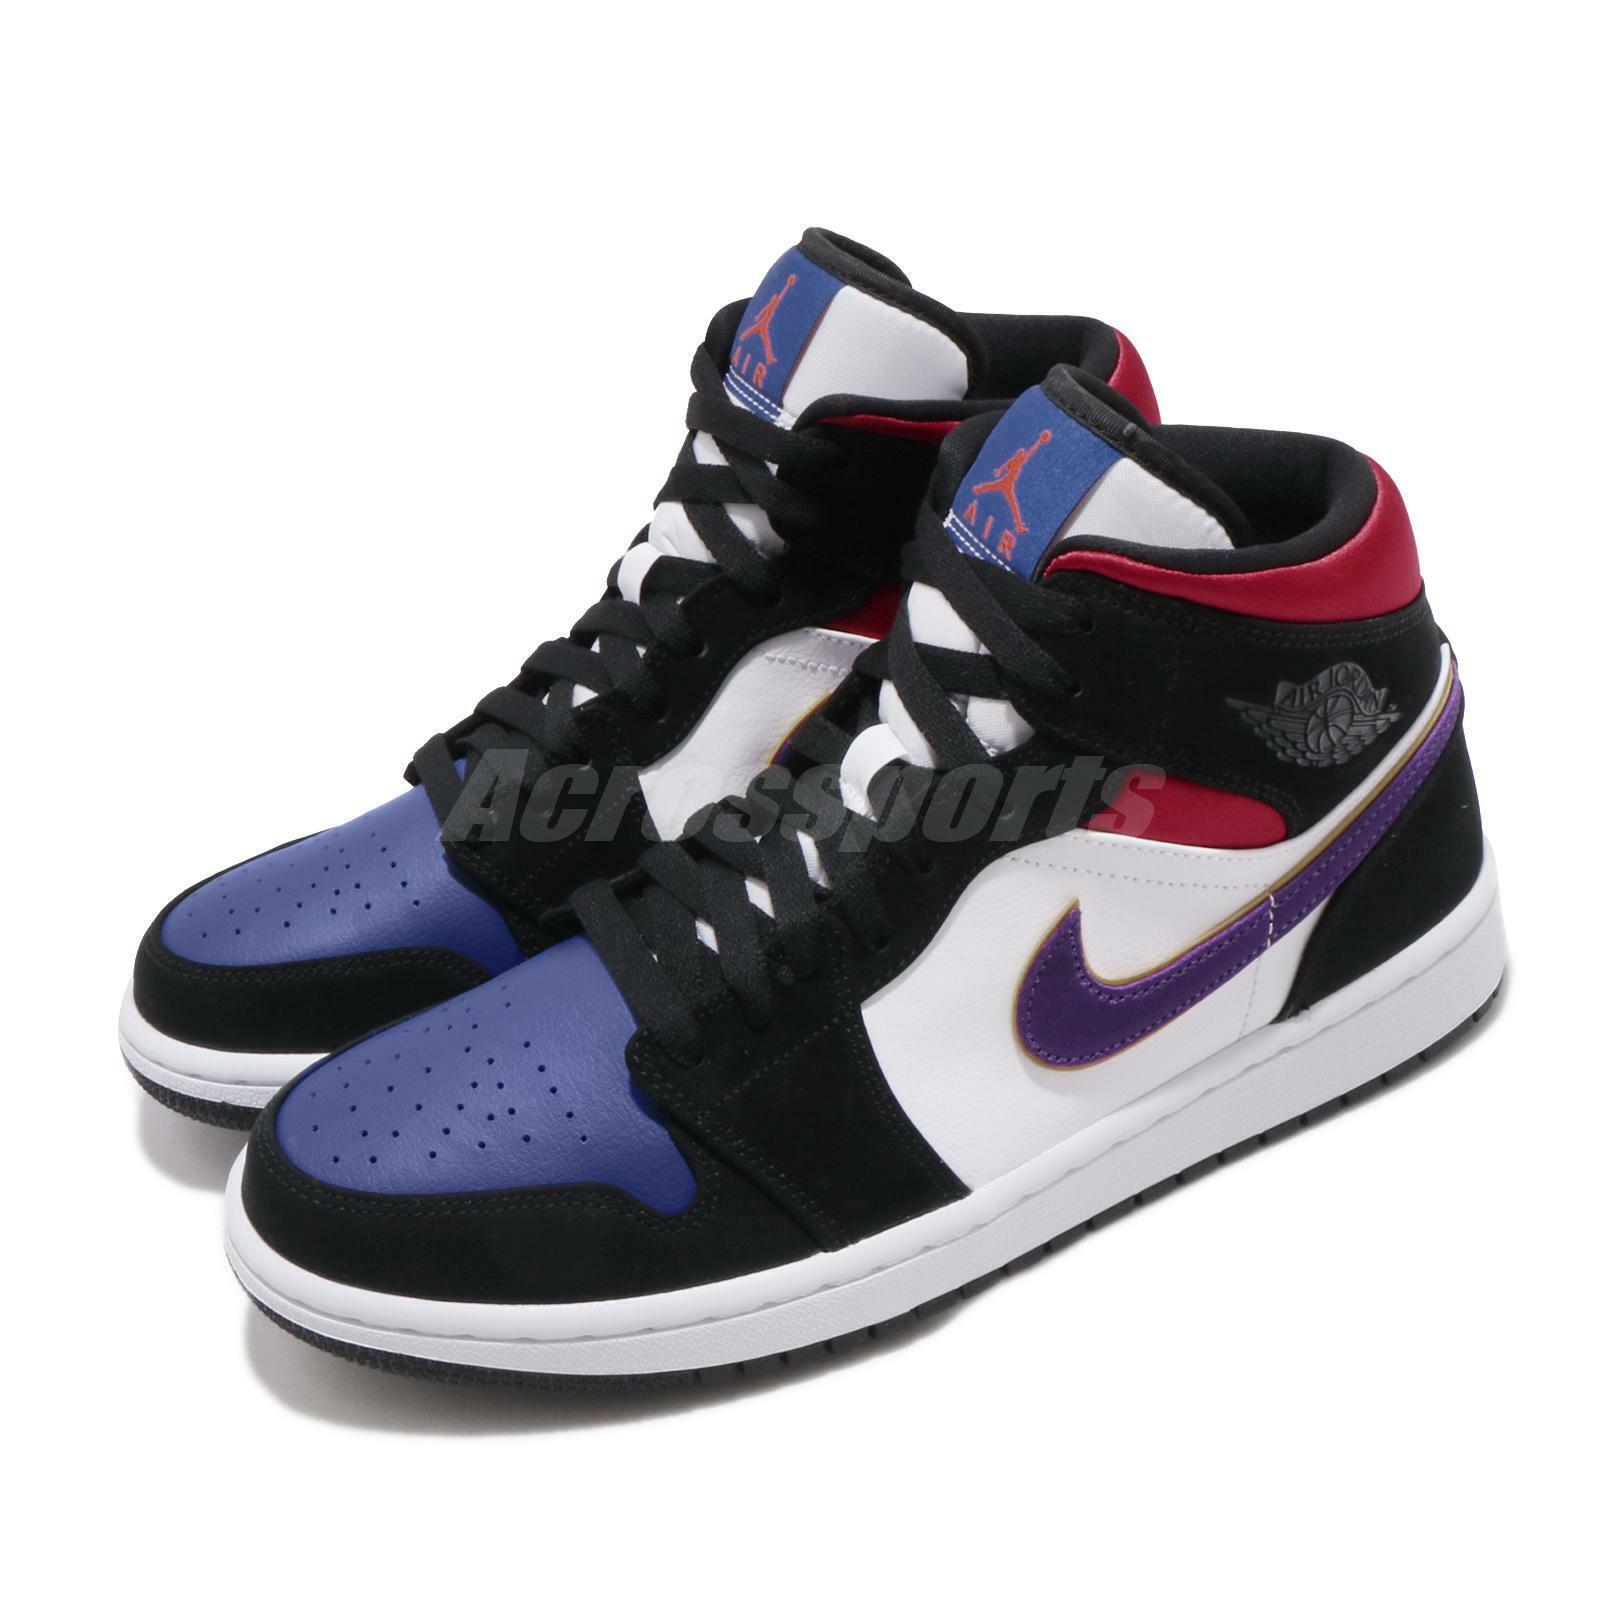 4b6279b7 Nike Air Jordan 1 Mid Premium Sz 10.5 Wool Winterized Black Red Gray 852542  001 for sale online | eBay